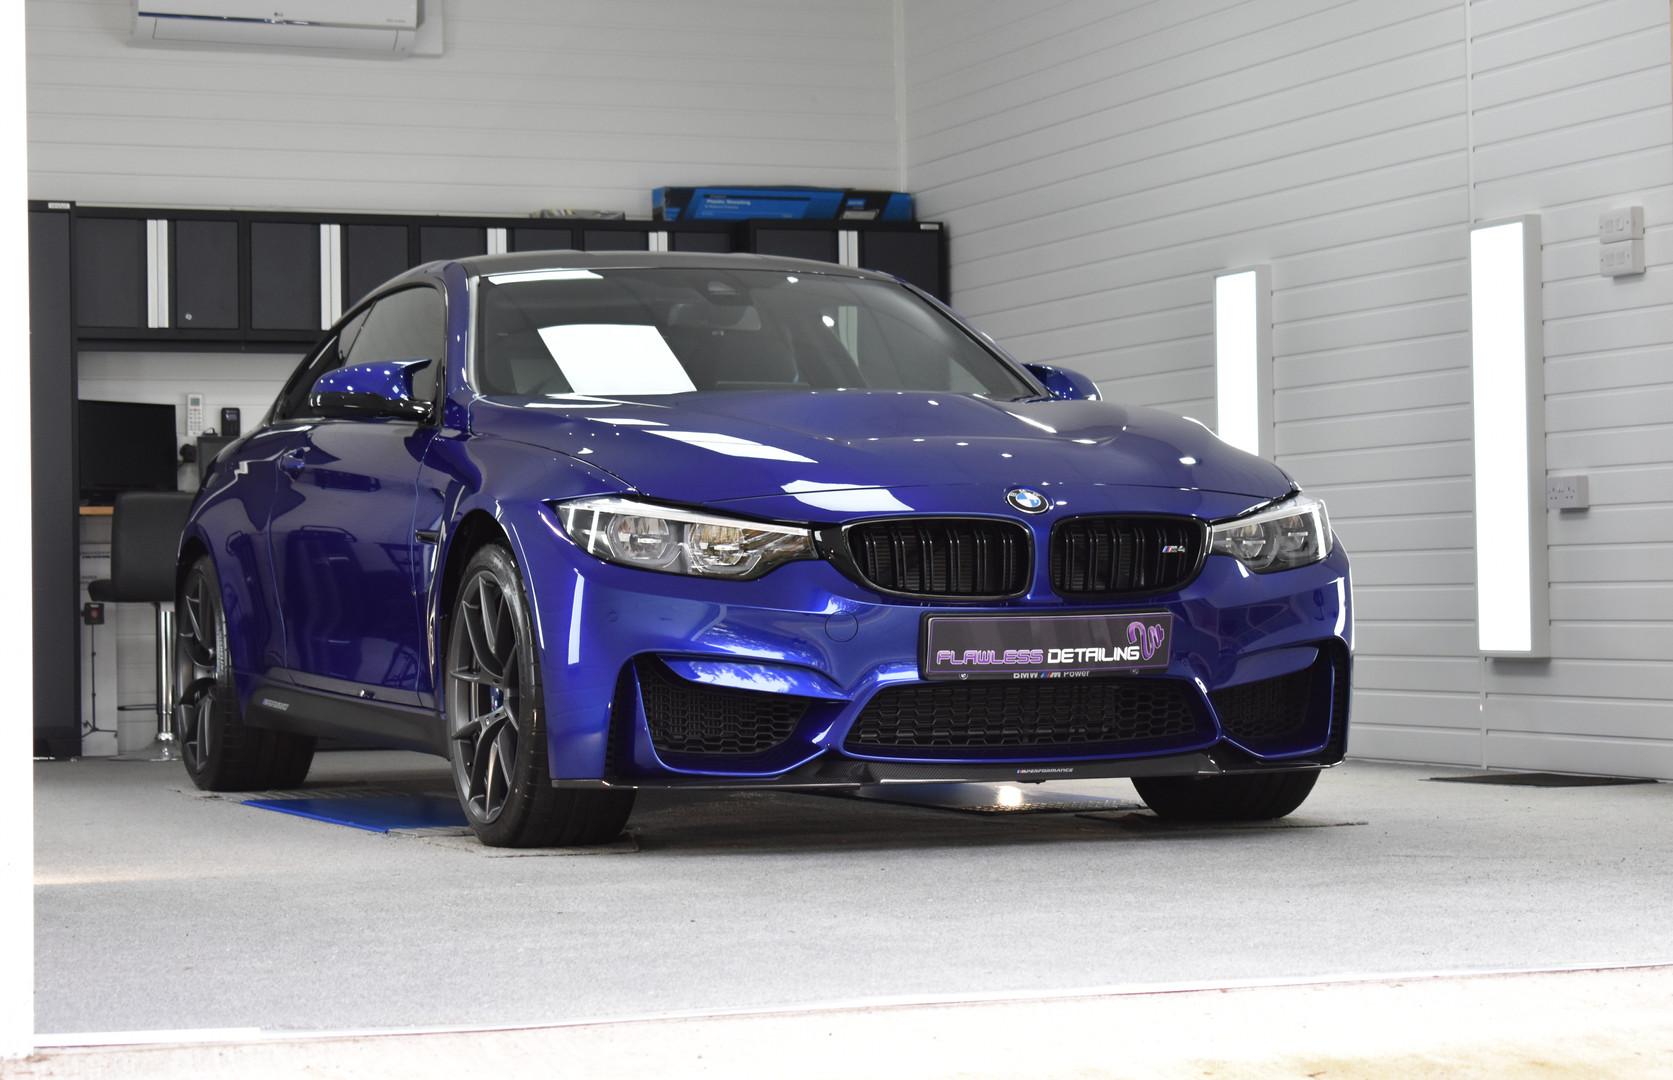 BMW M4 CS - Coventry, Solihull, Warwicks